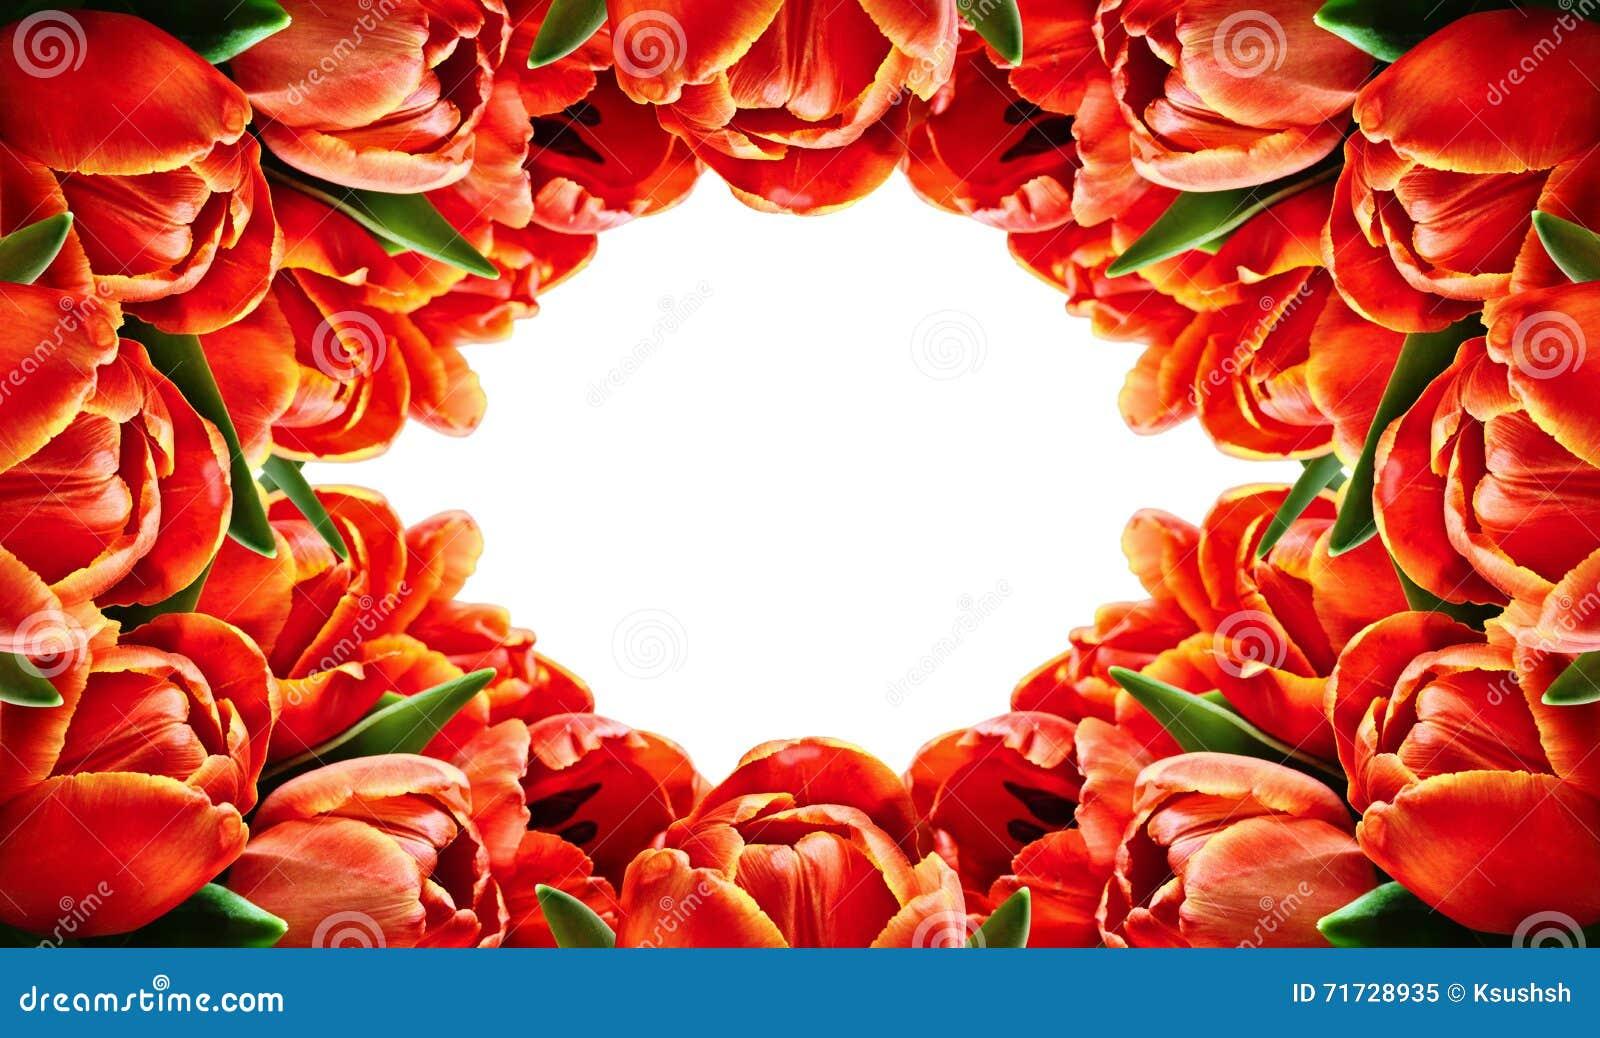 Red tulip flowers horizontal frame